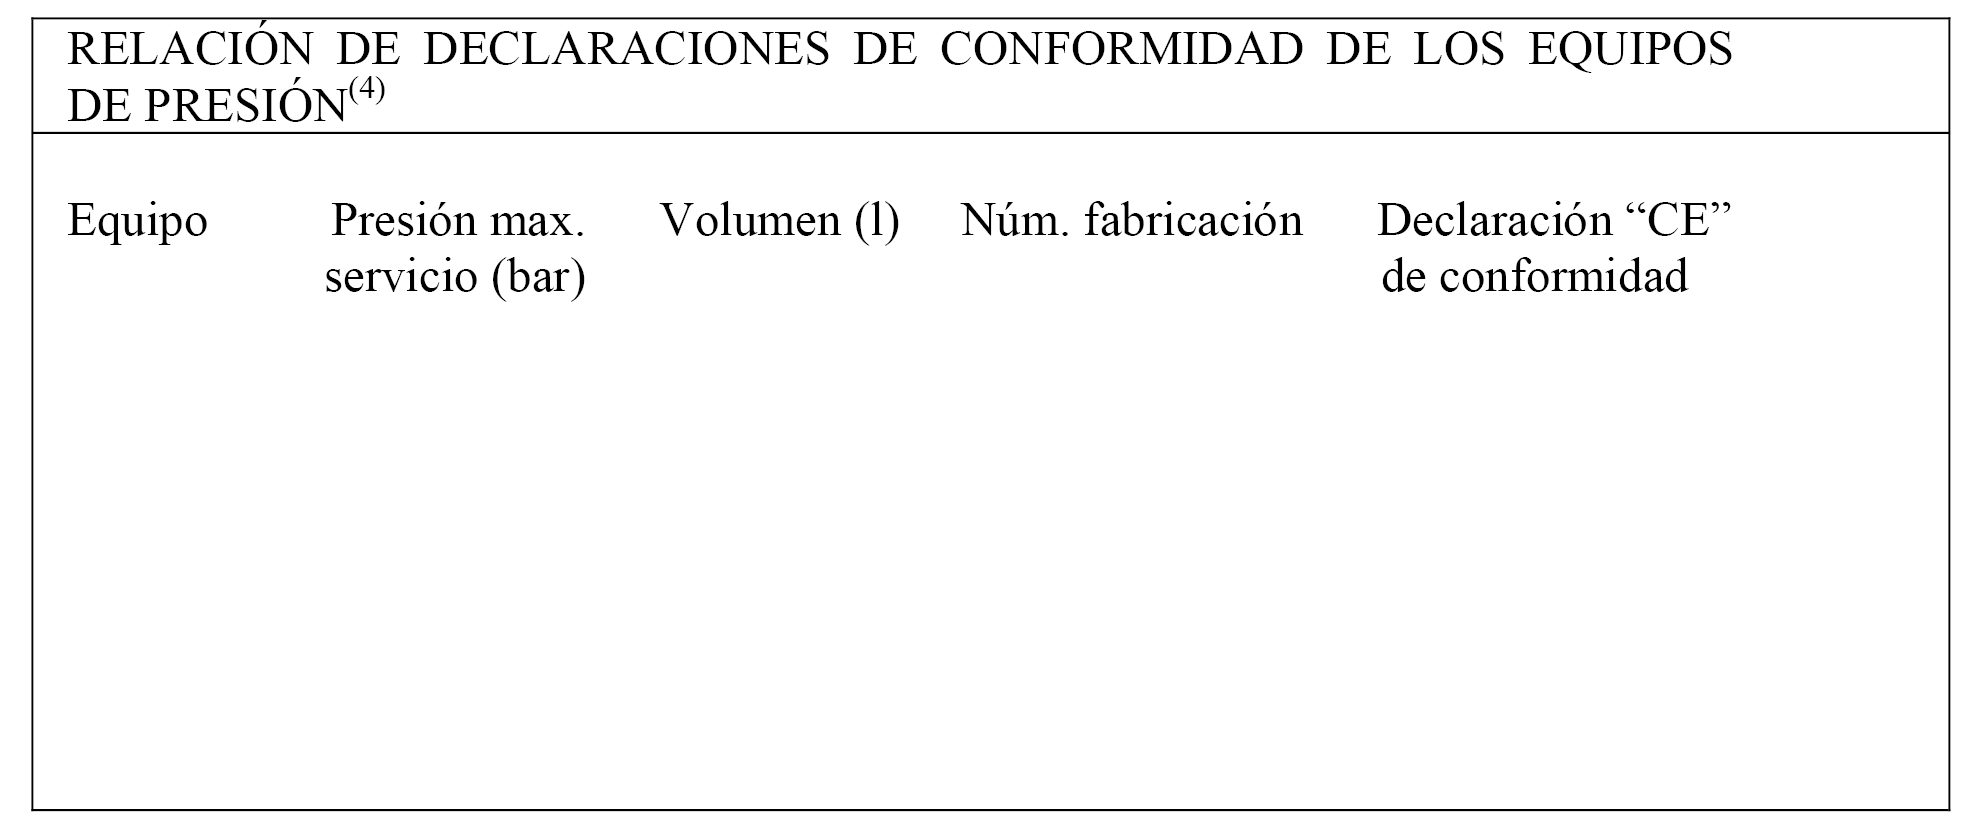 BOE.es - Documento BOE-A-2011-4292